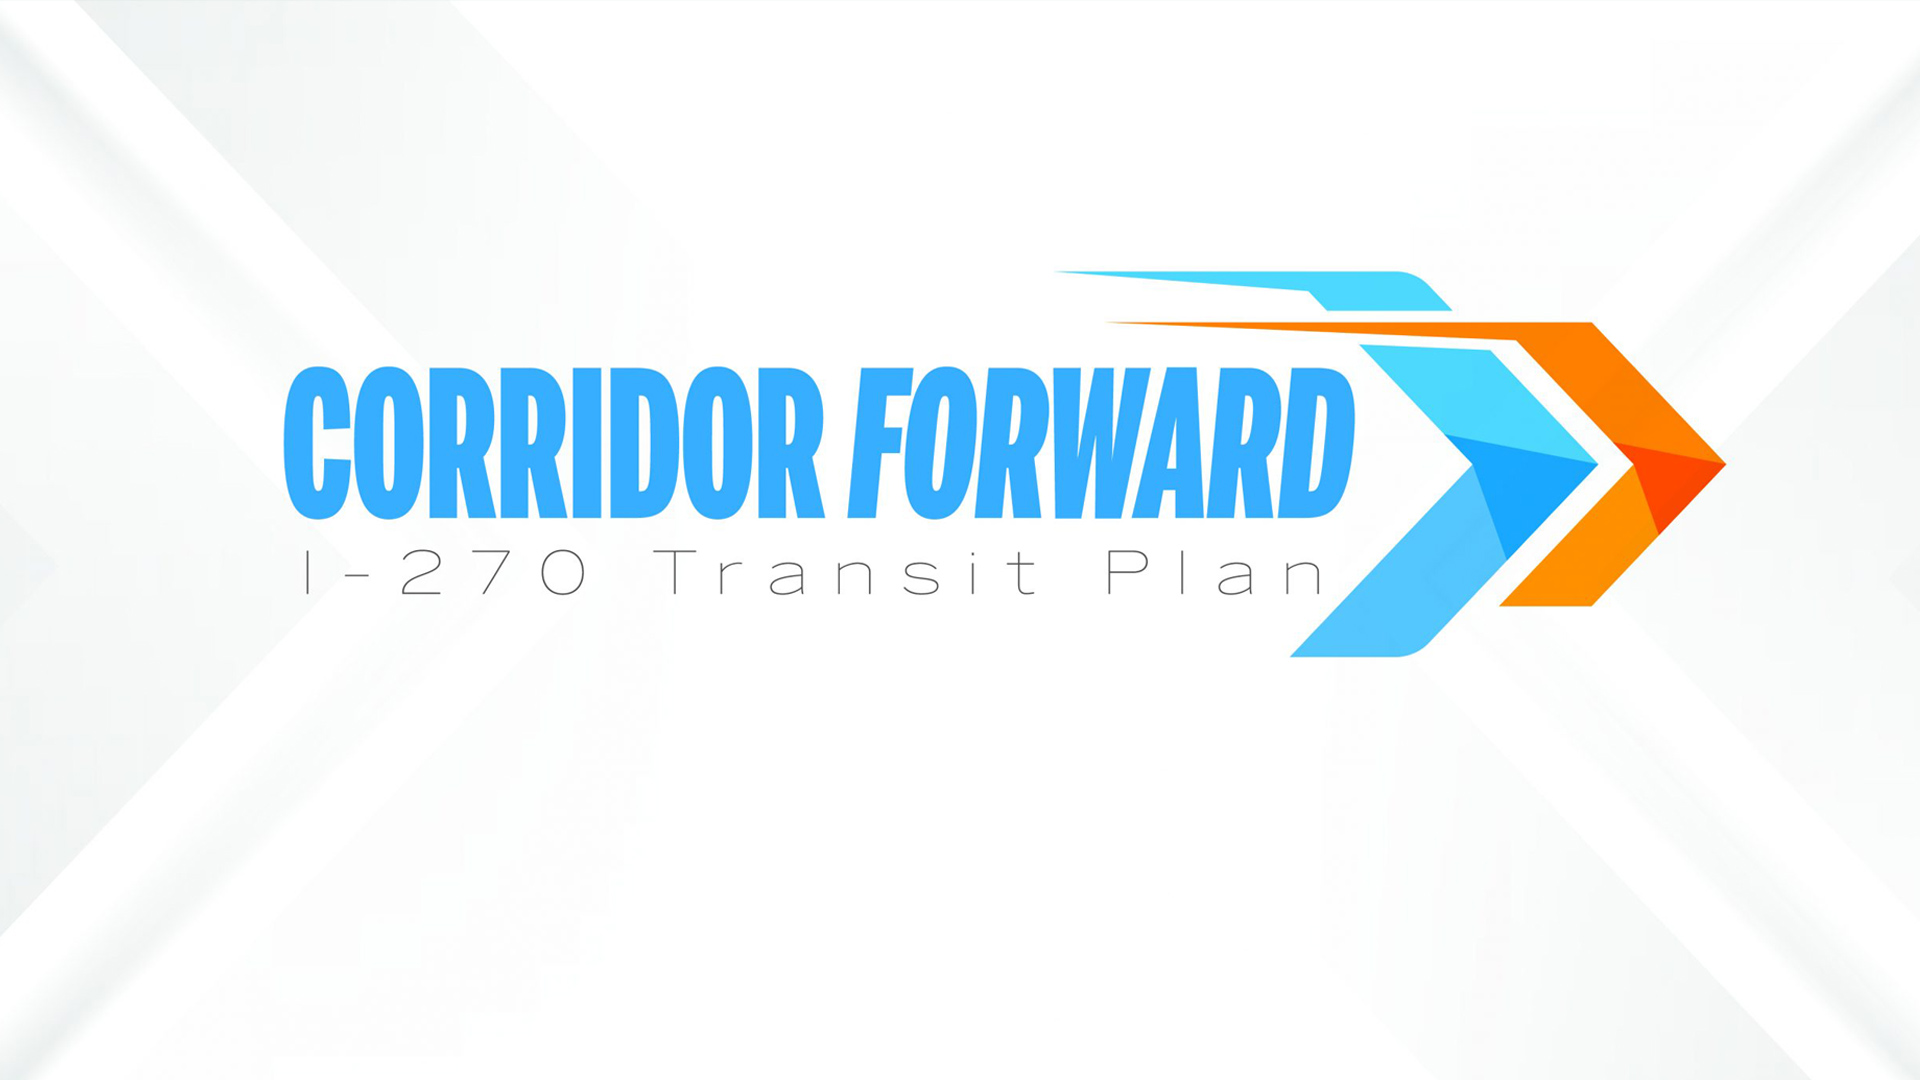 banner corridor forward